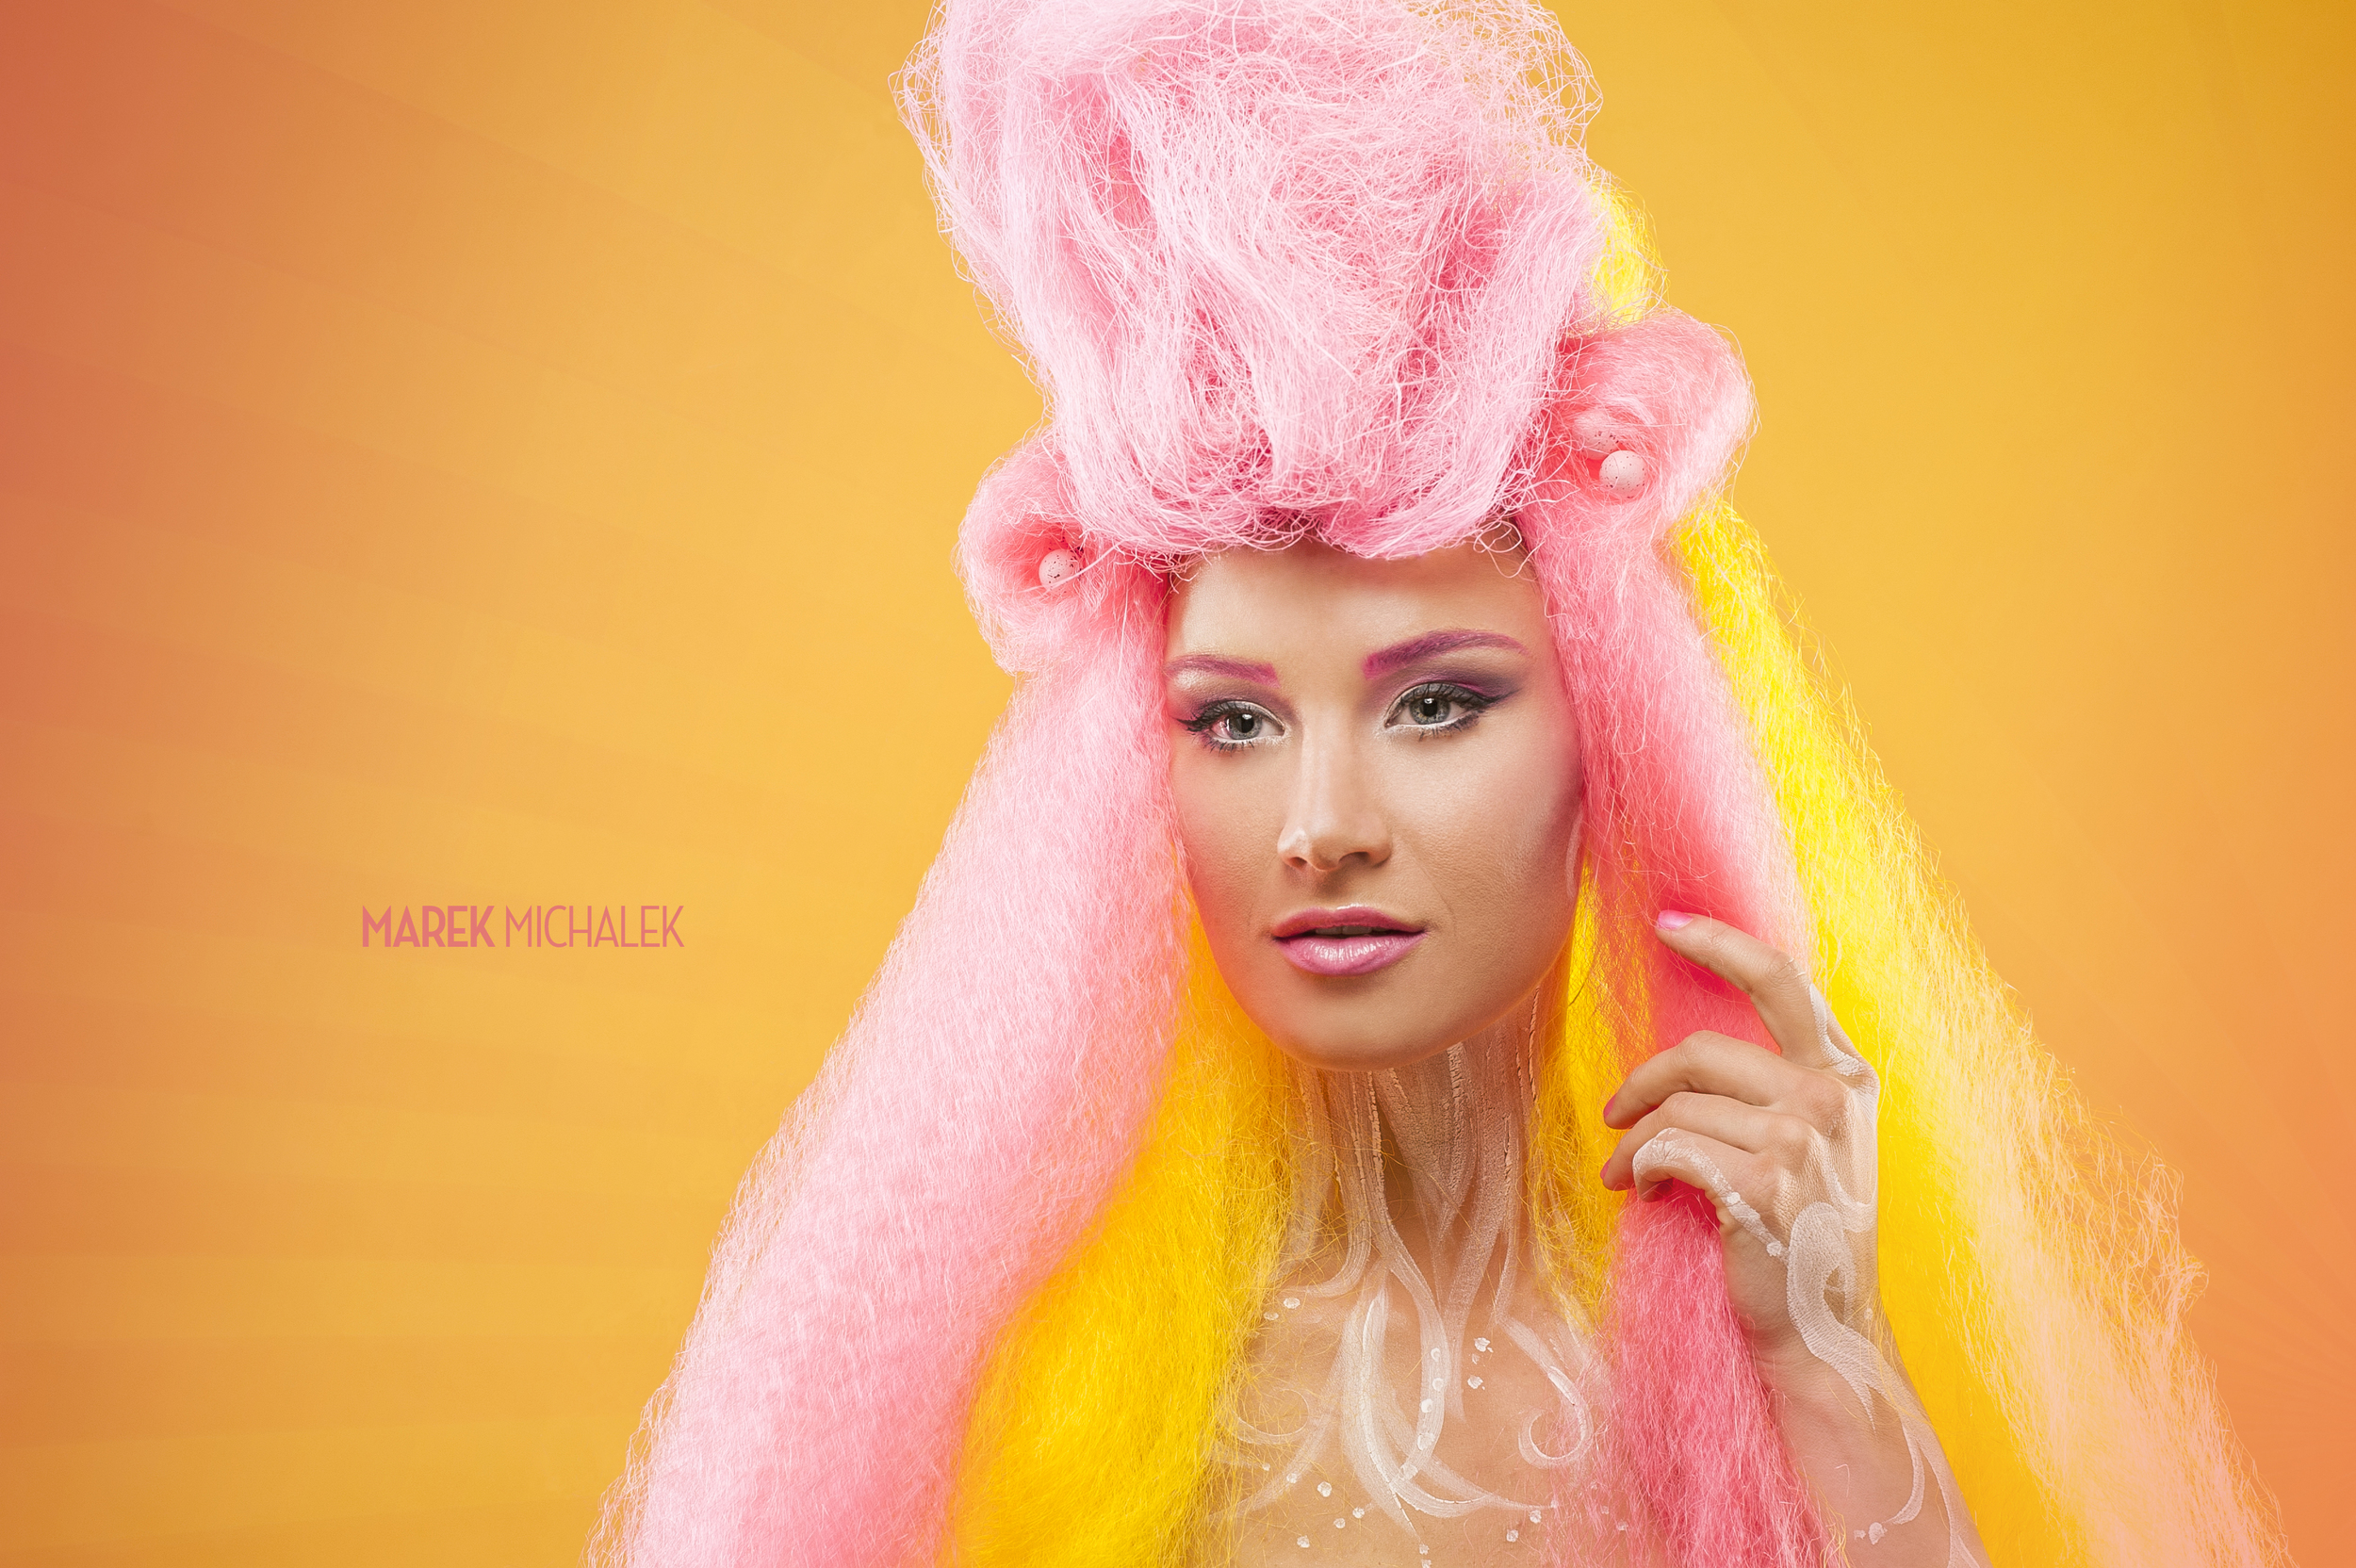 Hamilton Creative Fashion Photographer - Marek Michalek.jpg